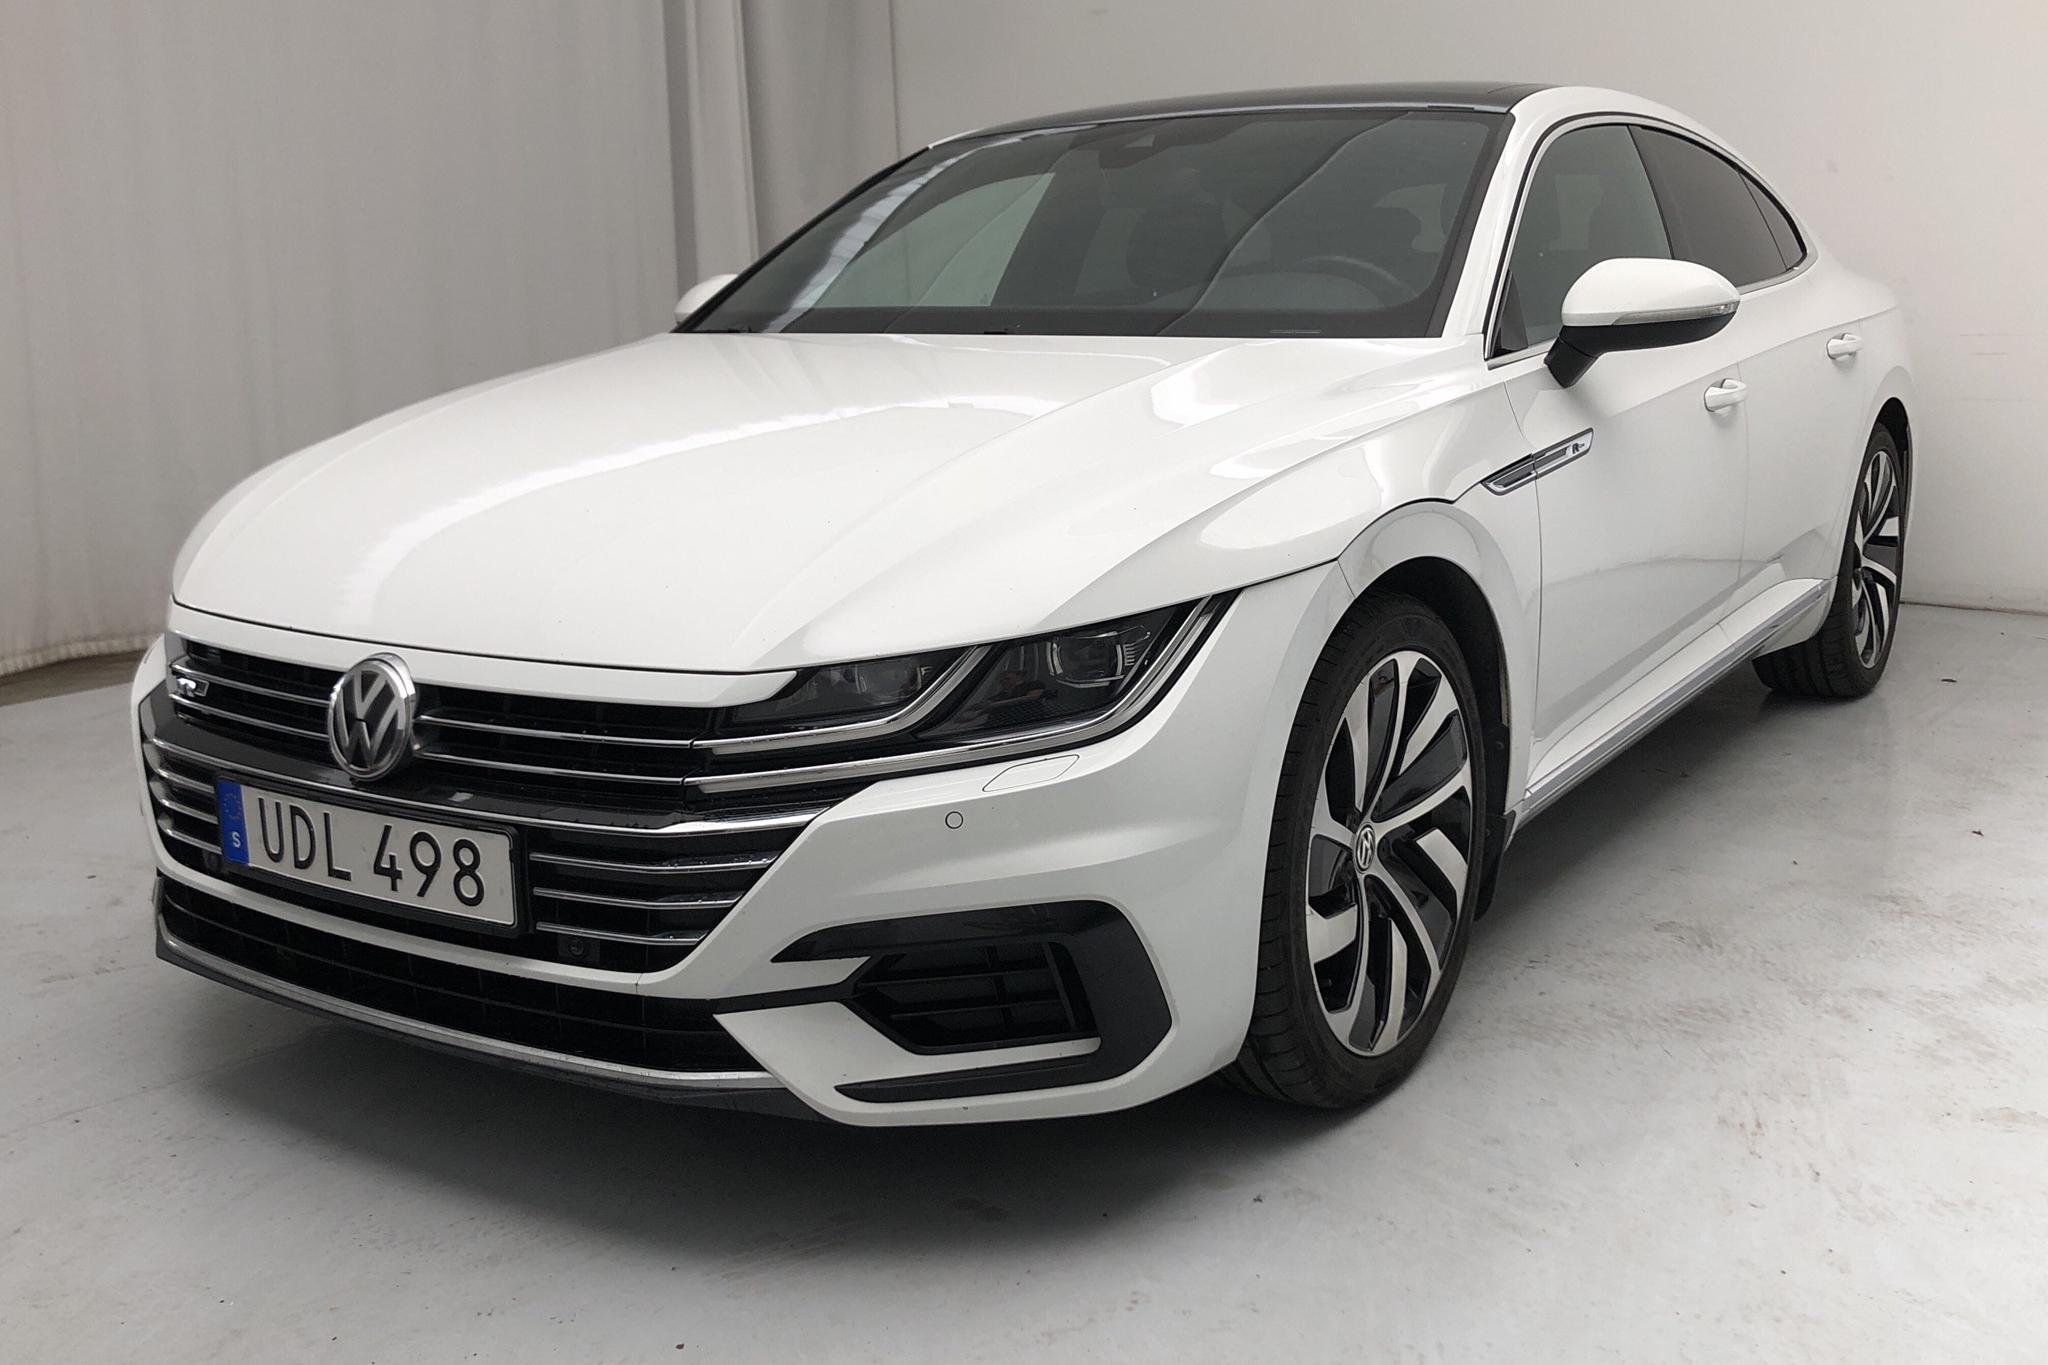 VW Arteon 2.0 TDI 4MOTION (190hk) - 9 921 mil - Automat - vit - 2018